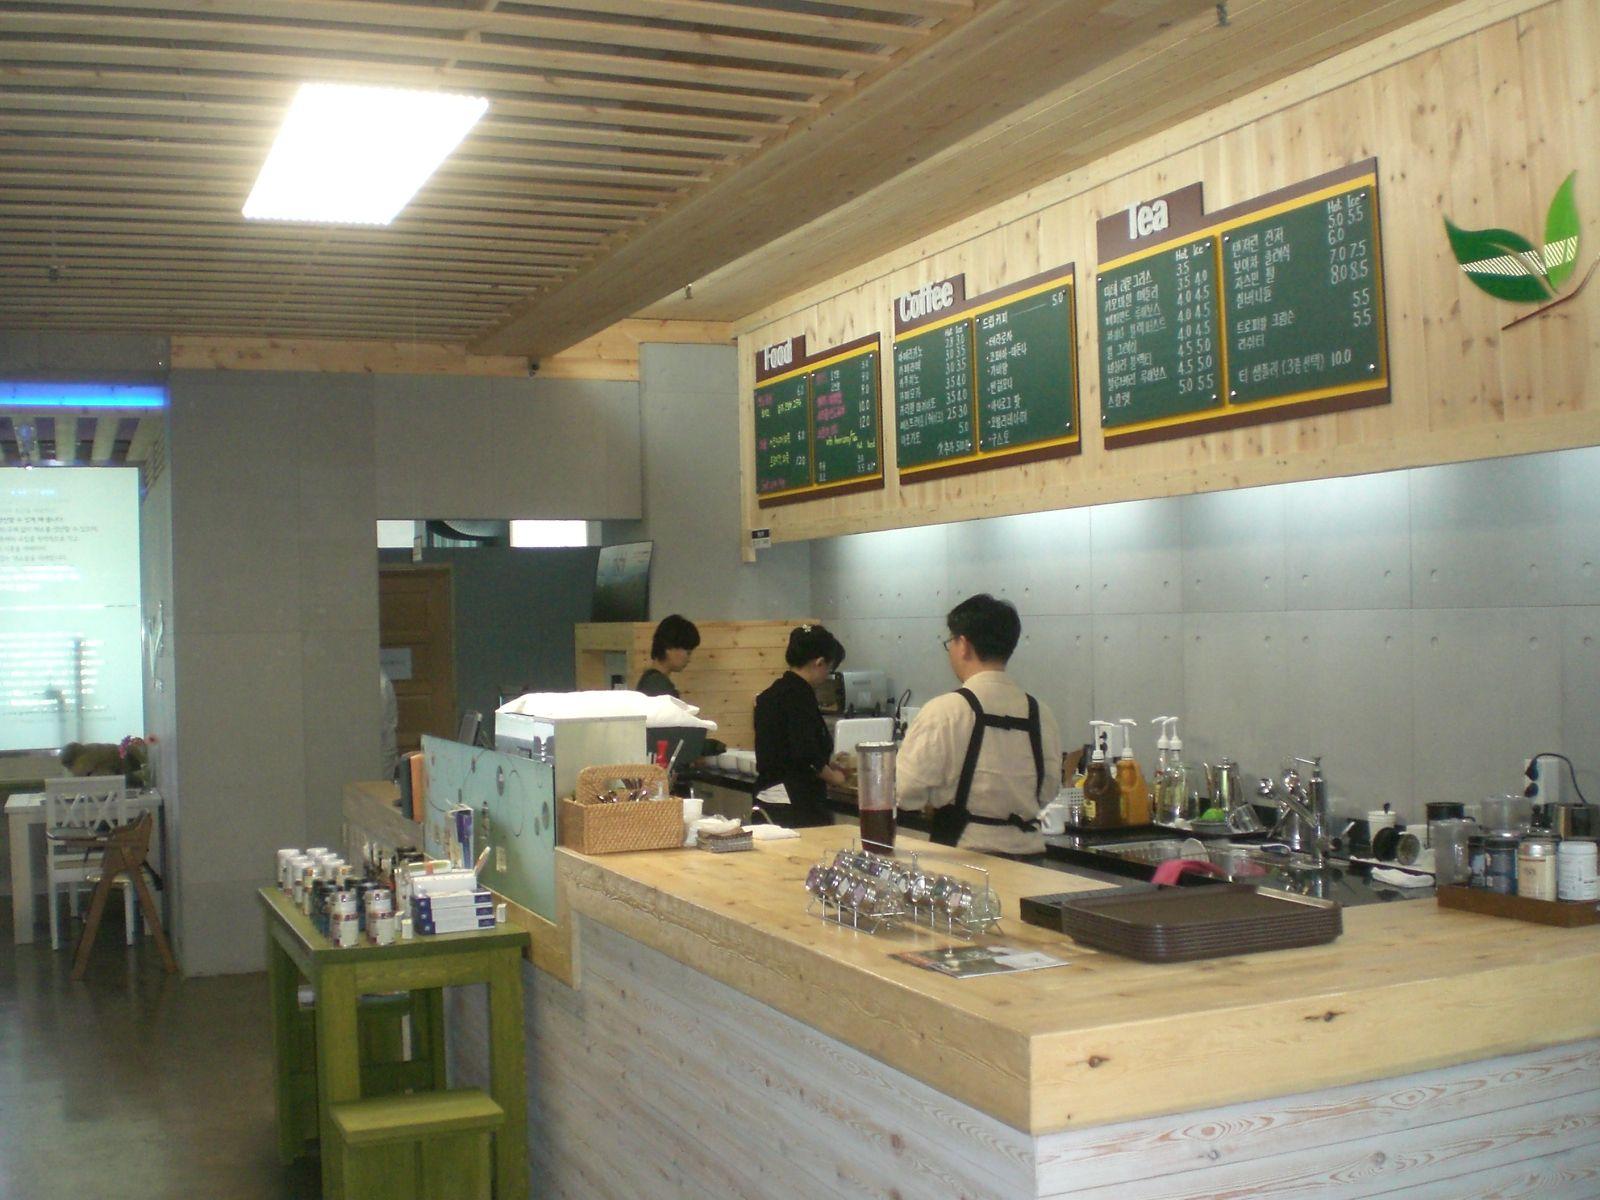 Citi-Farm Eco Cafe: Fresh Food, Low Impact   Juice bar design